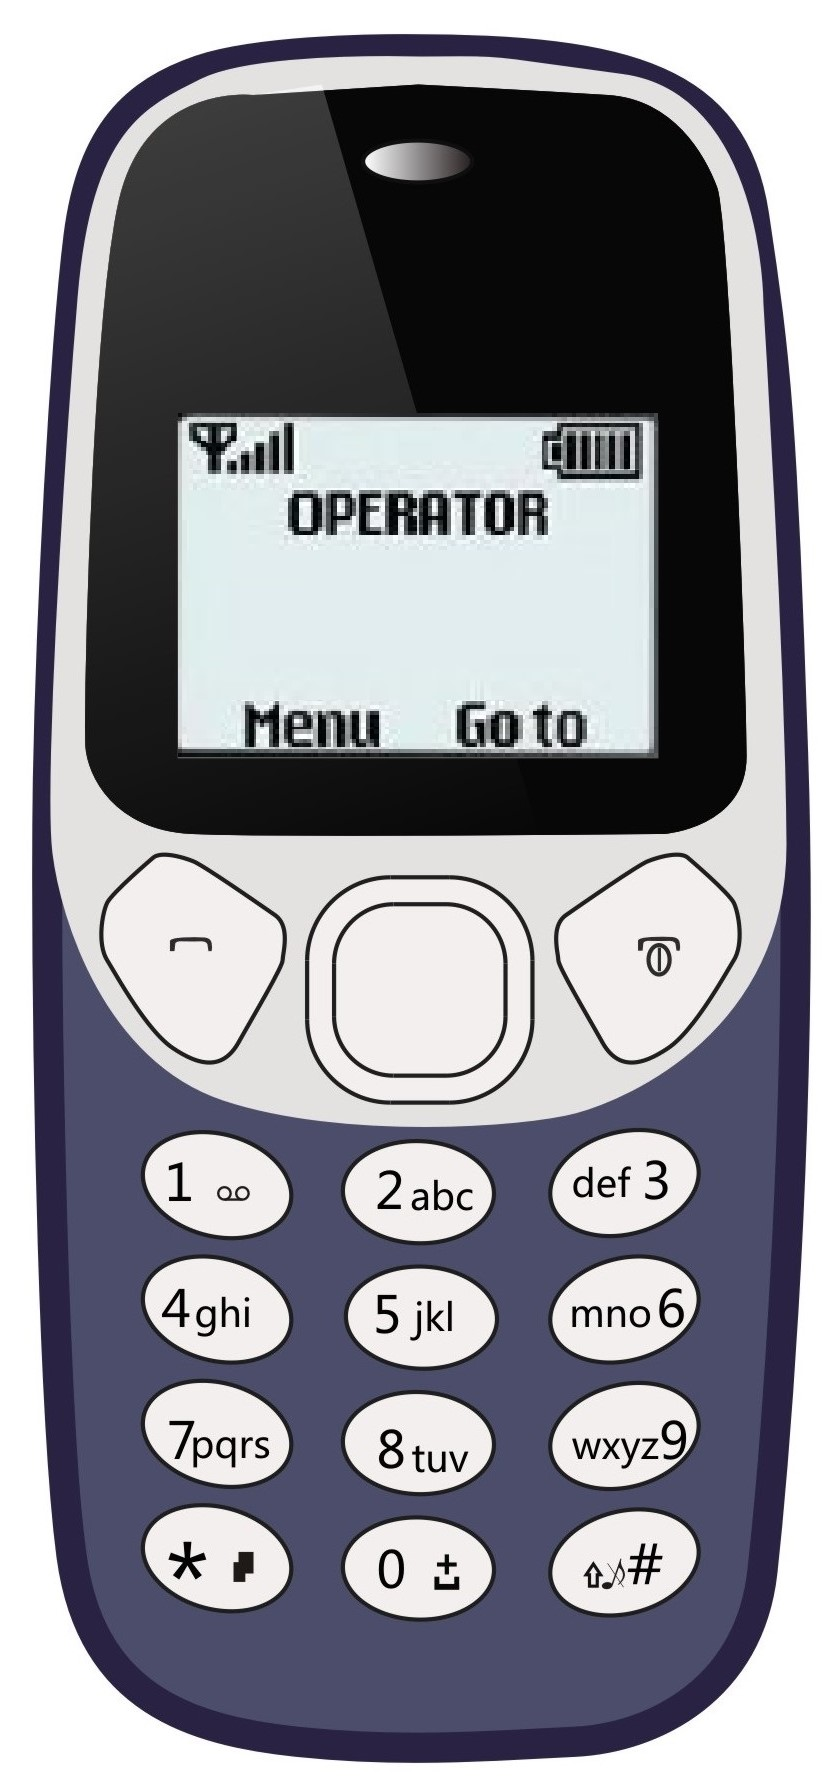 IKall K71 - (Single Sim, 1.4 Inch Display, 800 Mah battery)